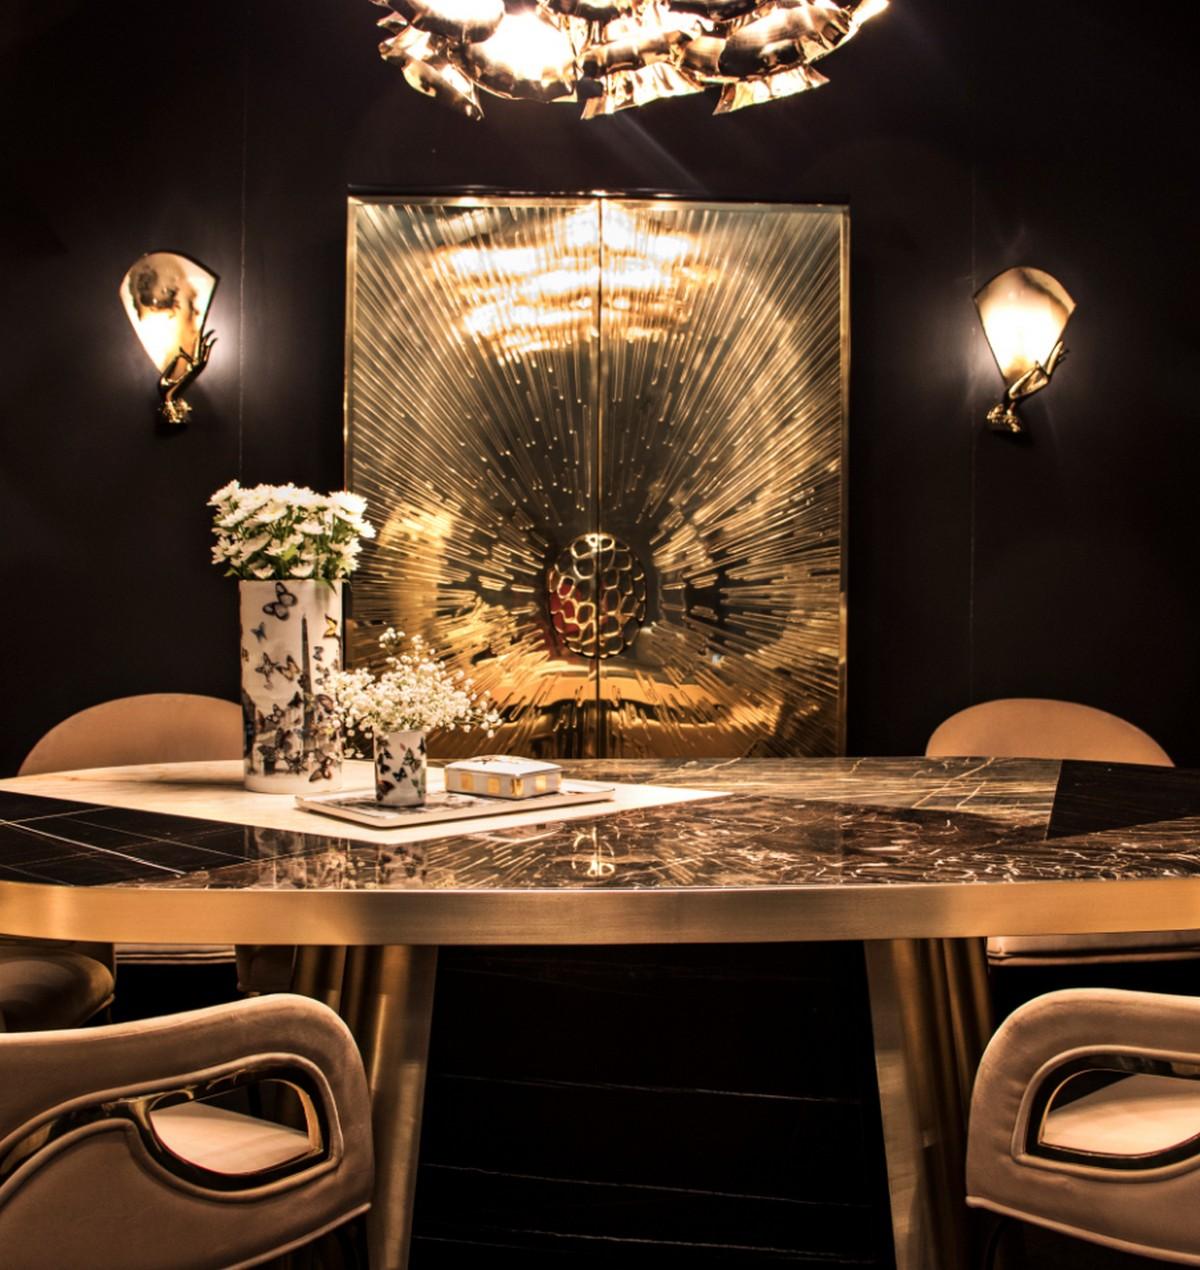 The Decodiva Dining Table: Craftsmanship Meets Contemporary Design contemporary design The Decodiva Dining Table: Craftsmanship Meets Contemporary Design 2 2